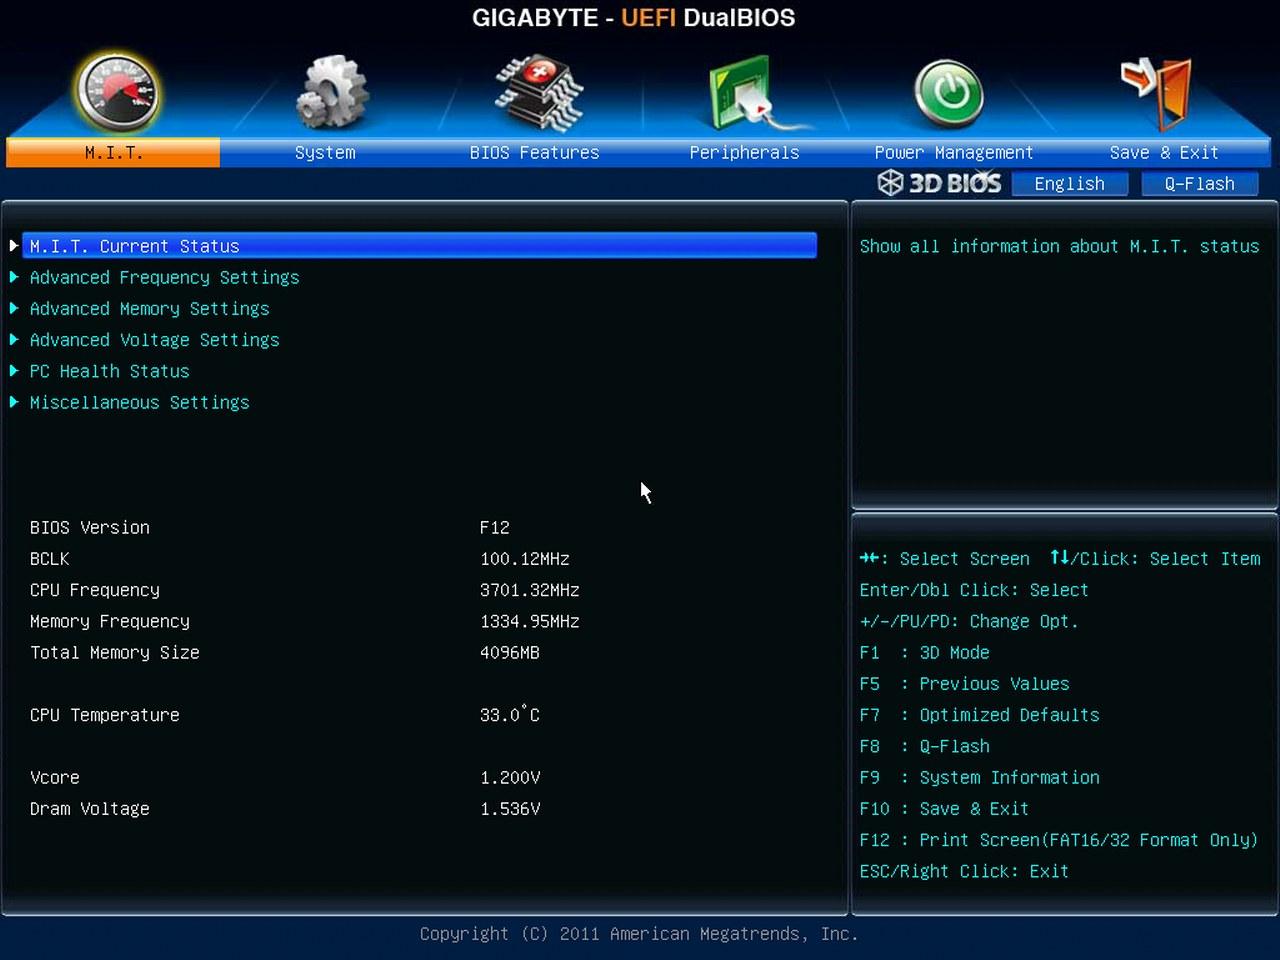 Gigabyte Z77X-UD5H-WB WIFI, BIOS UEFI, M.I.T.